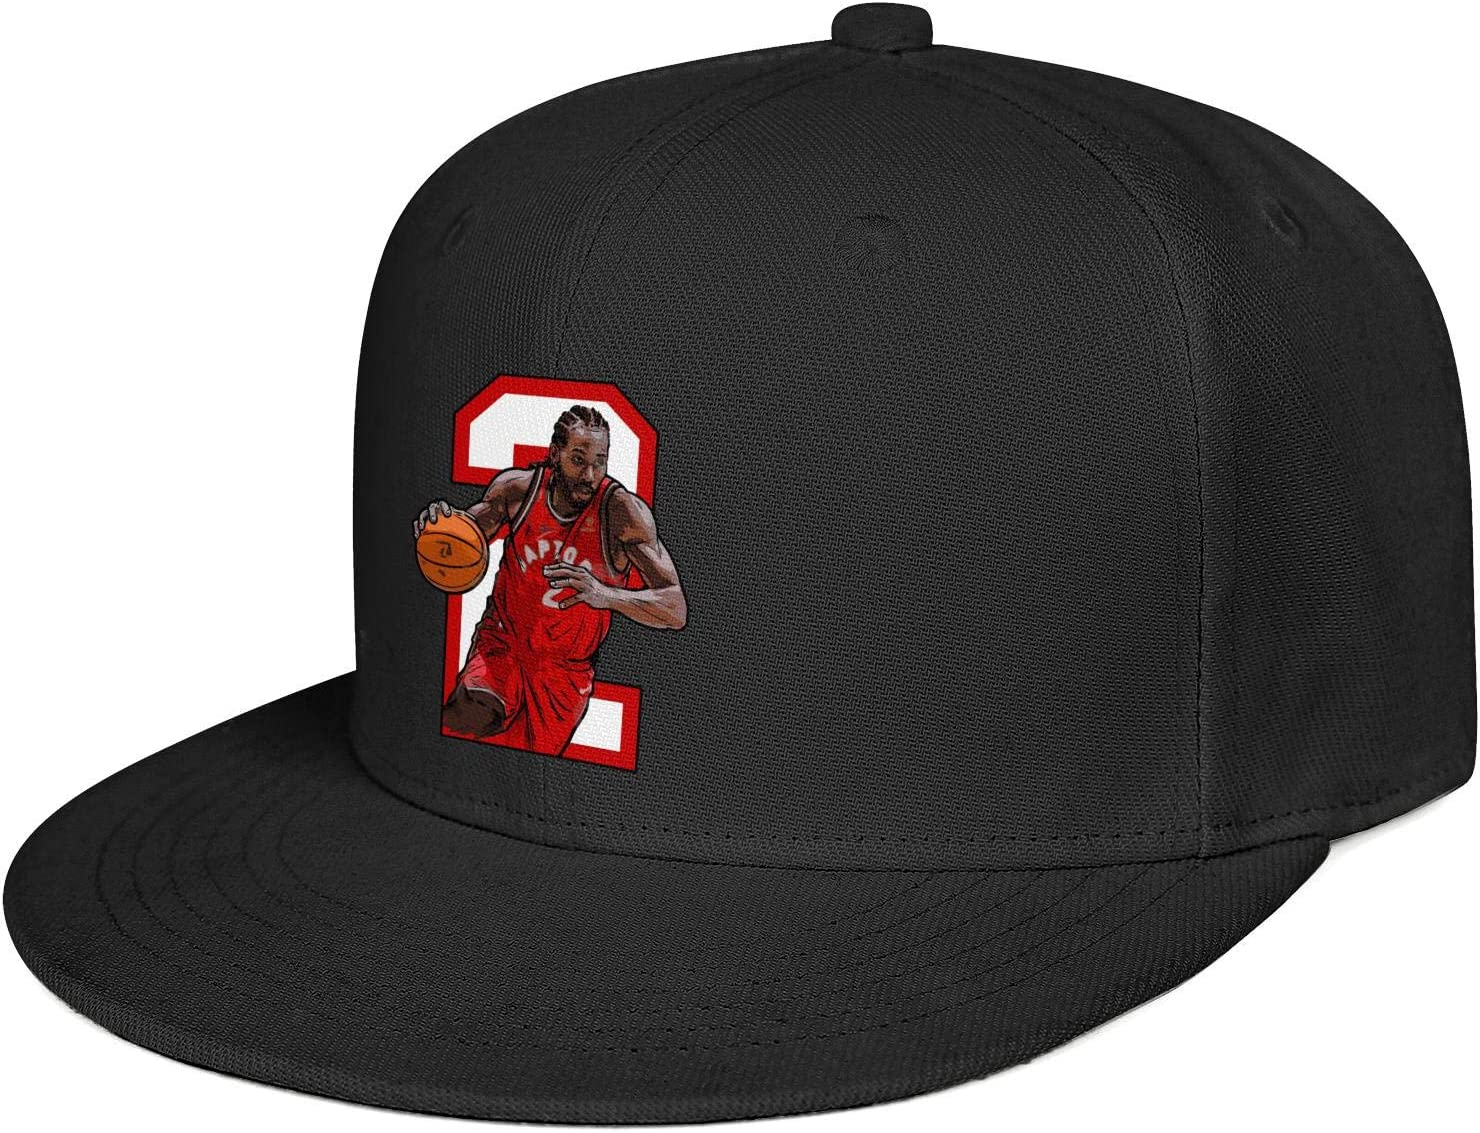 Haggai Romeo Unisex Kawhi-Leonard Photo Snapback Baseball Cap Flat Brim Hip Hop Hat Adjustable Dad Hat